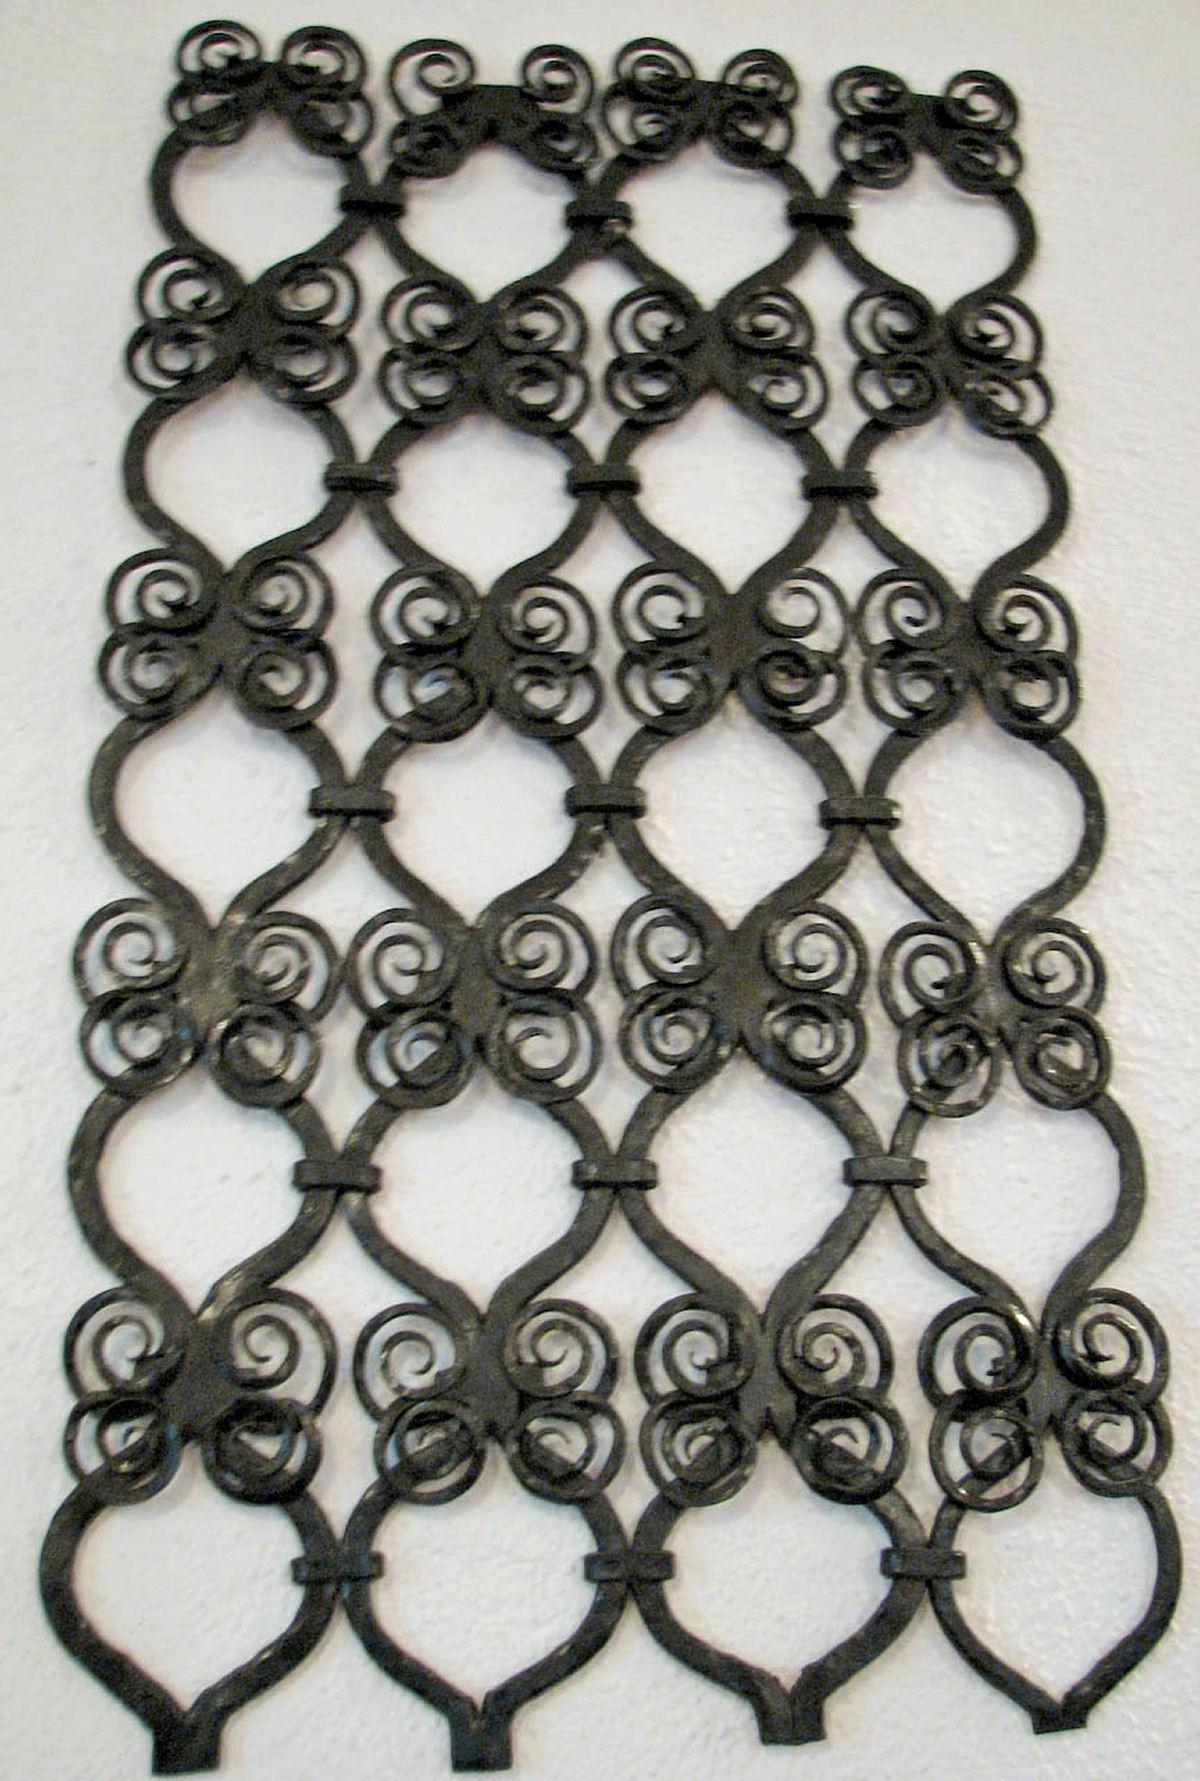 kropa-iron-forging-ironwork-04-museum